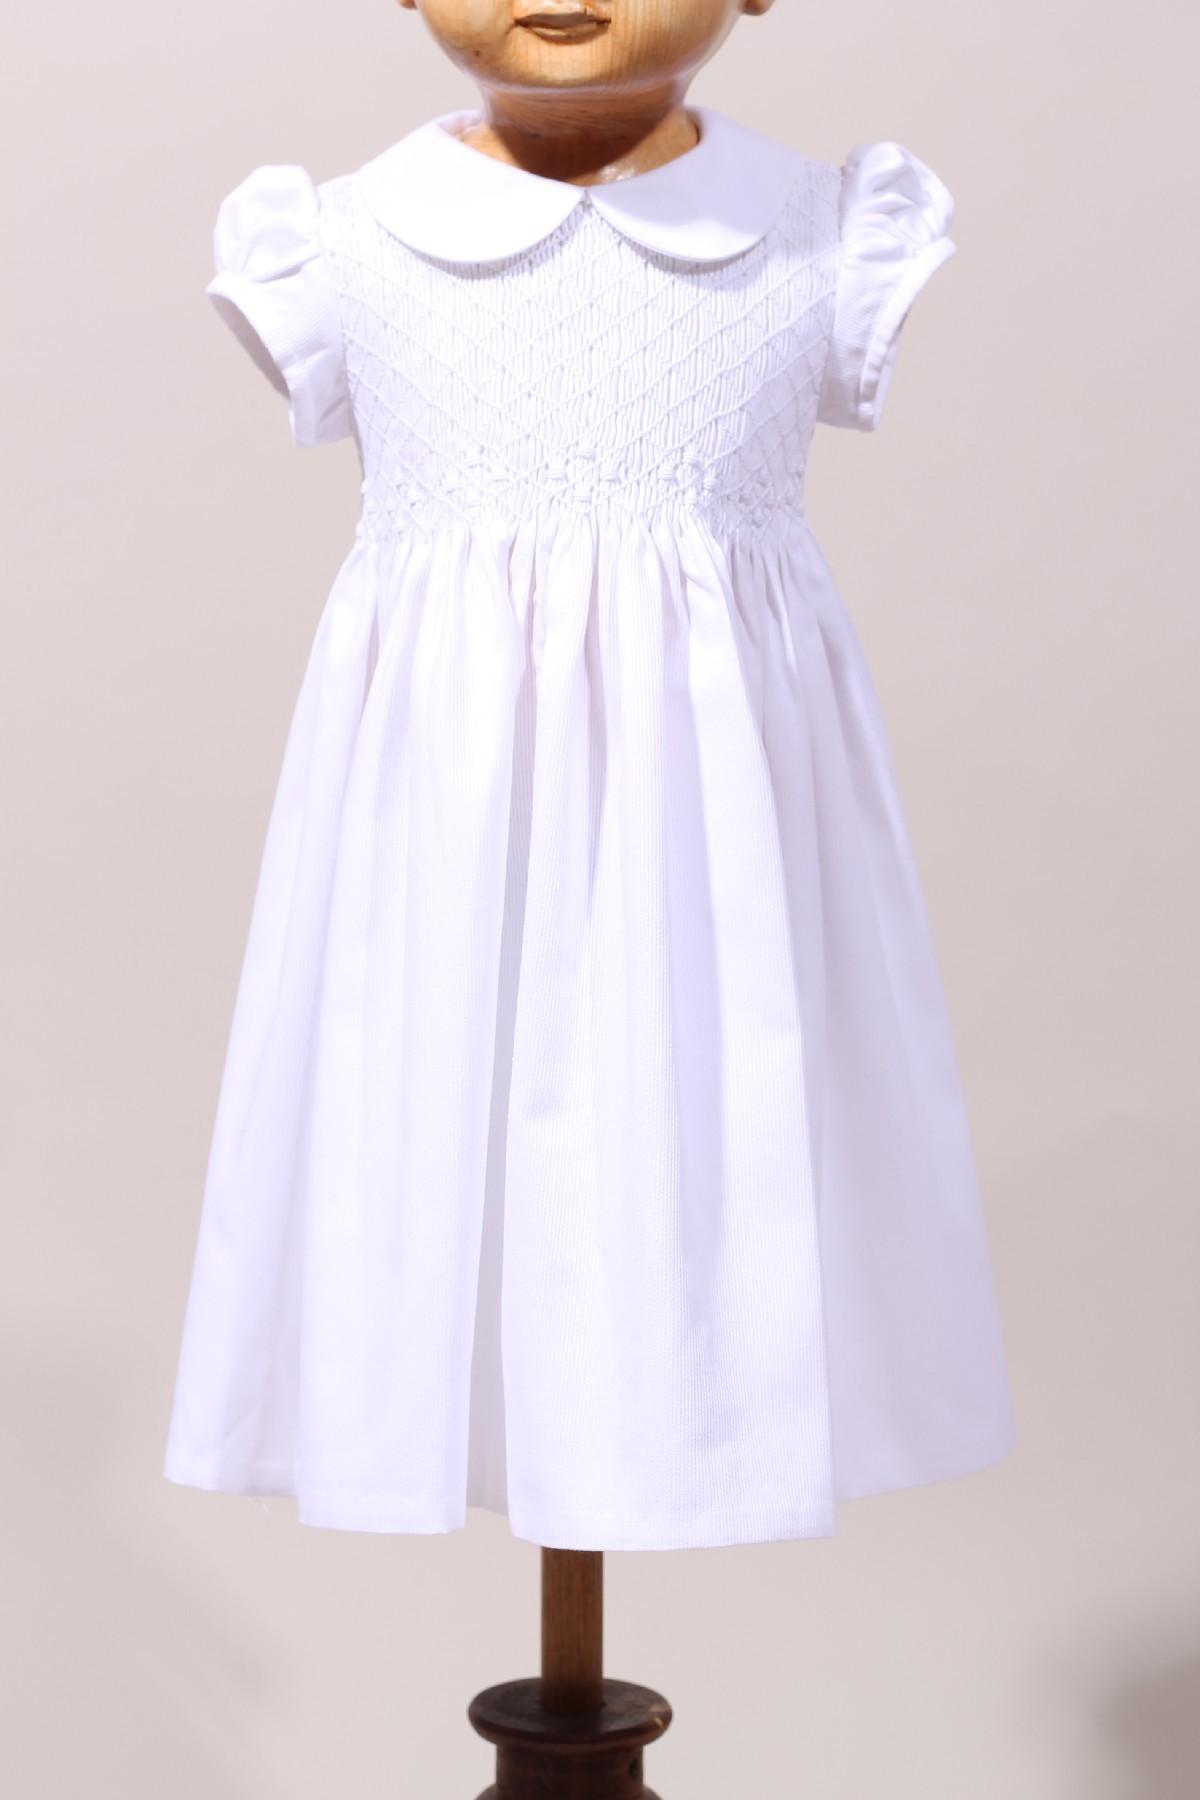 robe crmonie fille robe de bapteme